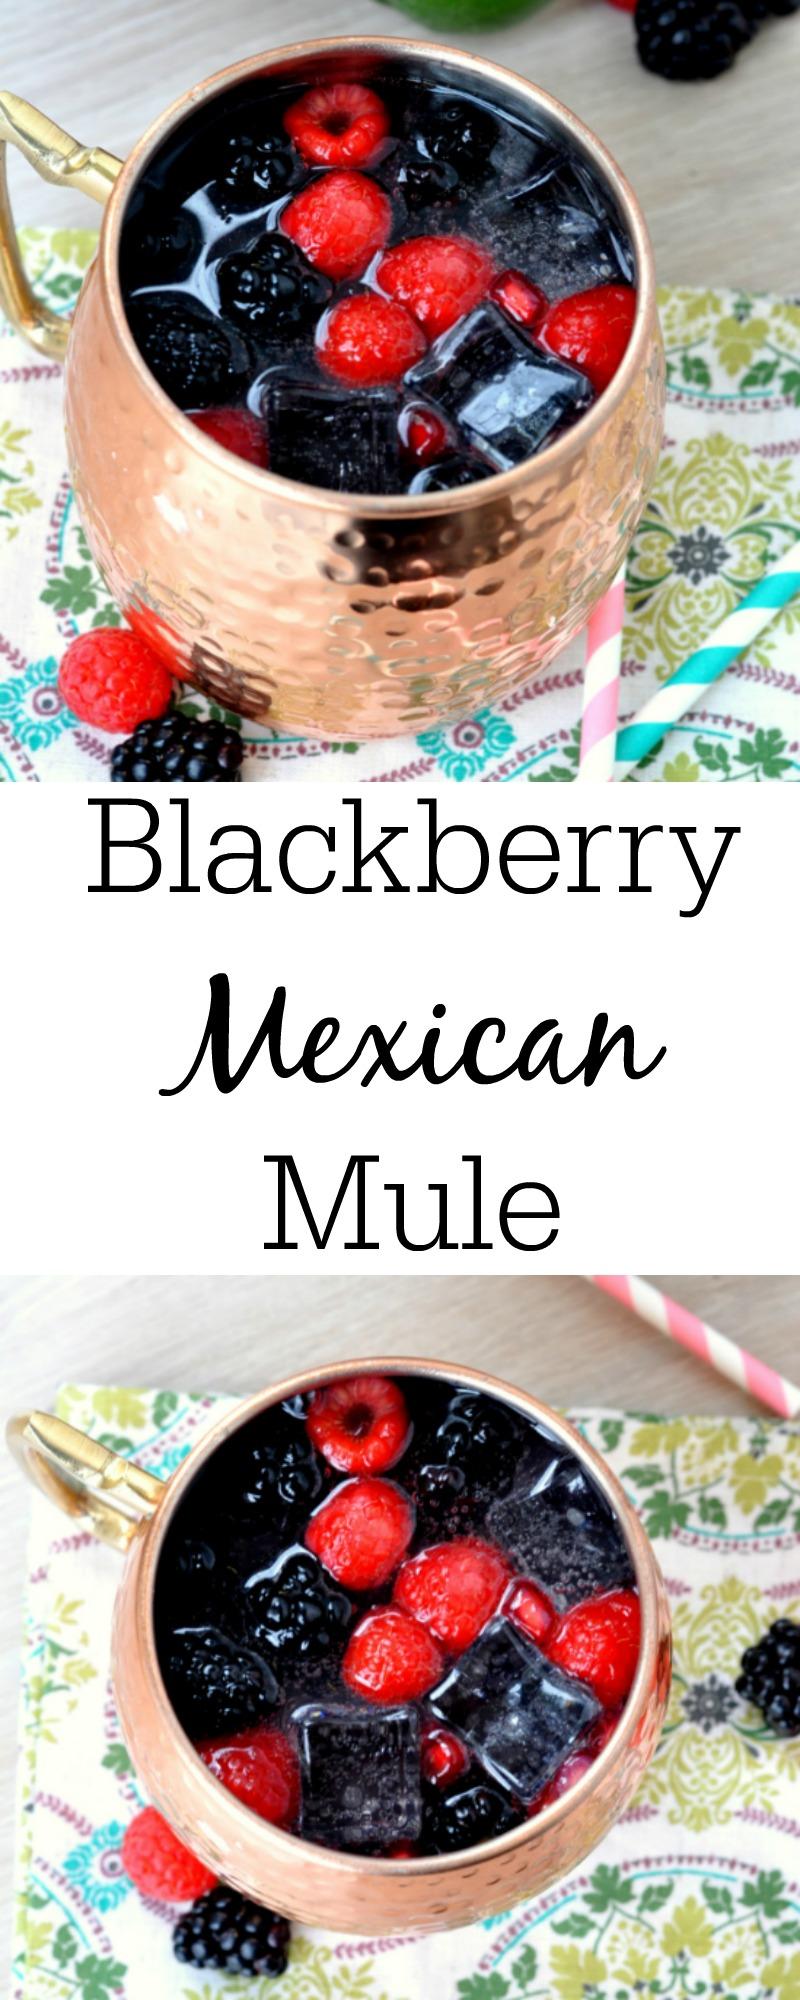 Blackberry Mexican Mule